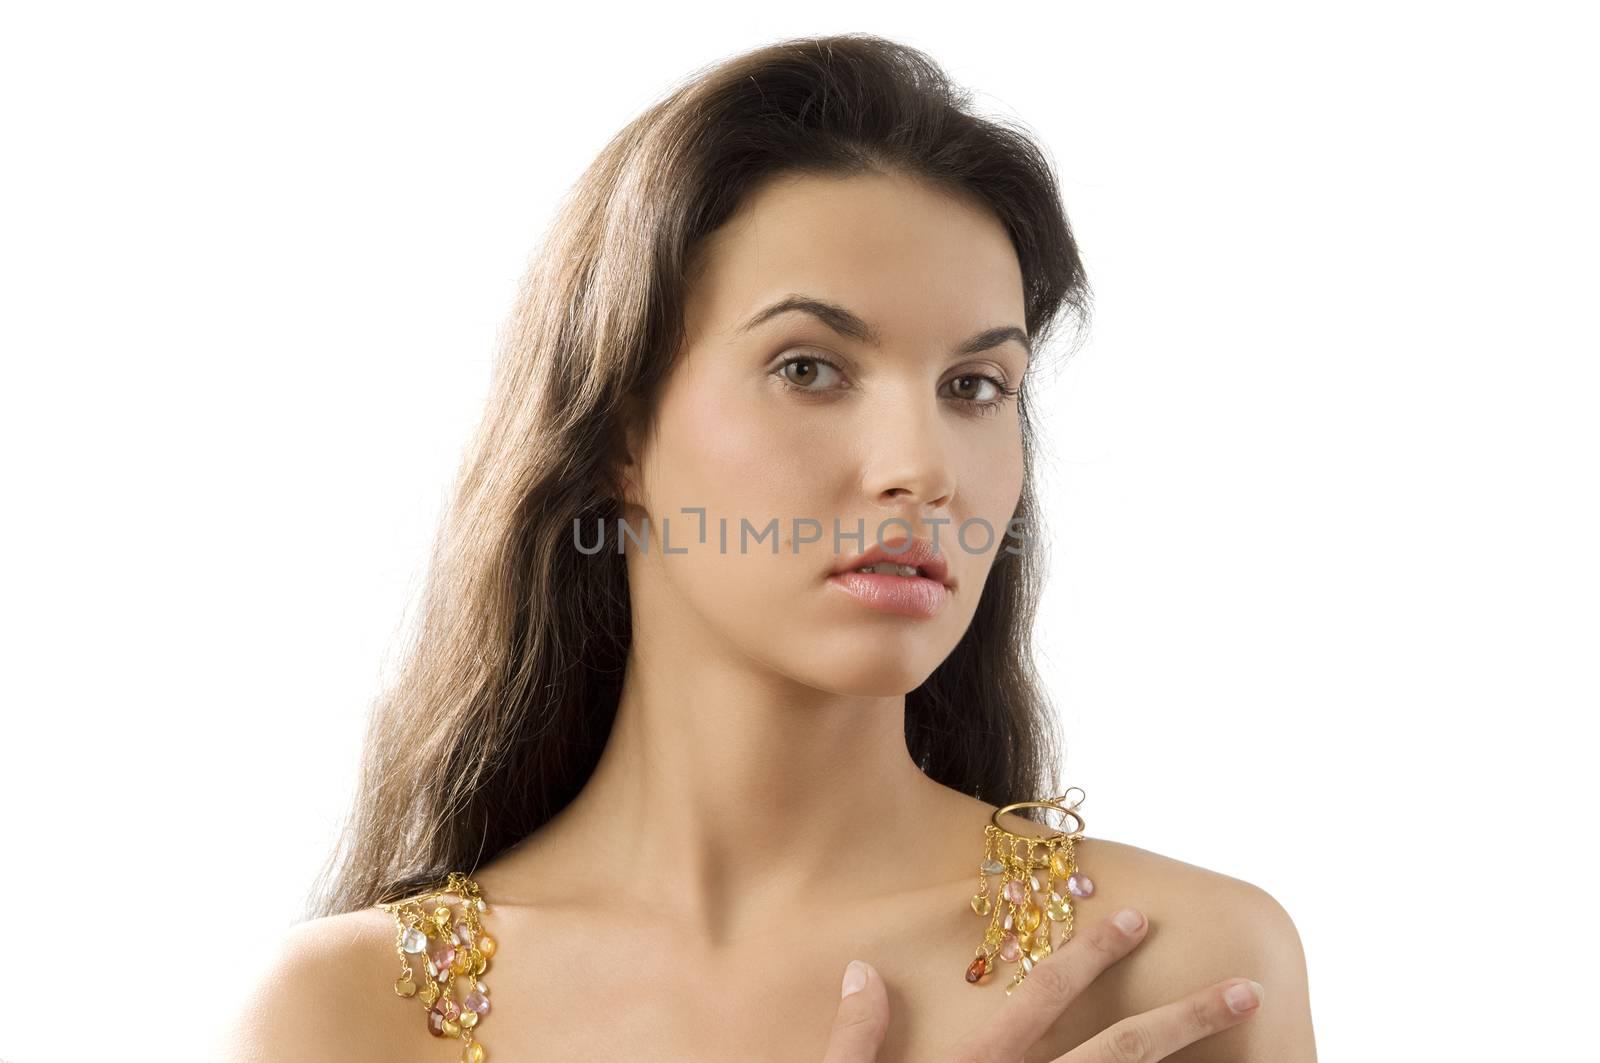 sensual brunette with golden earrings on shoulder